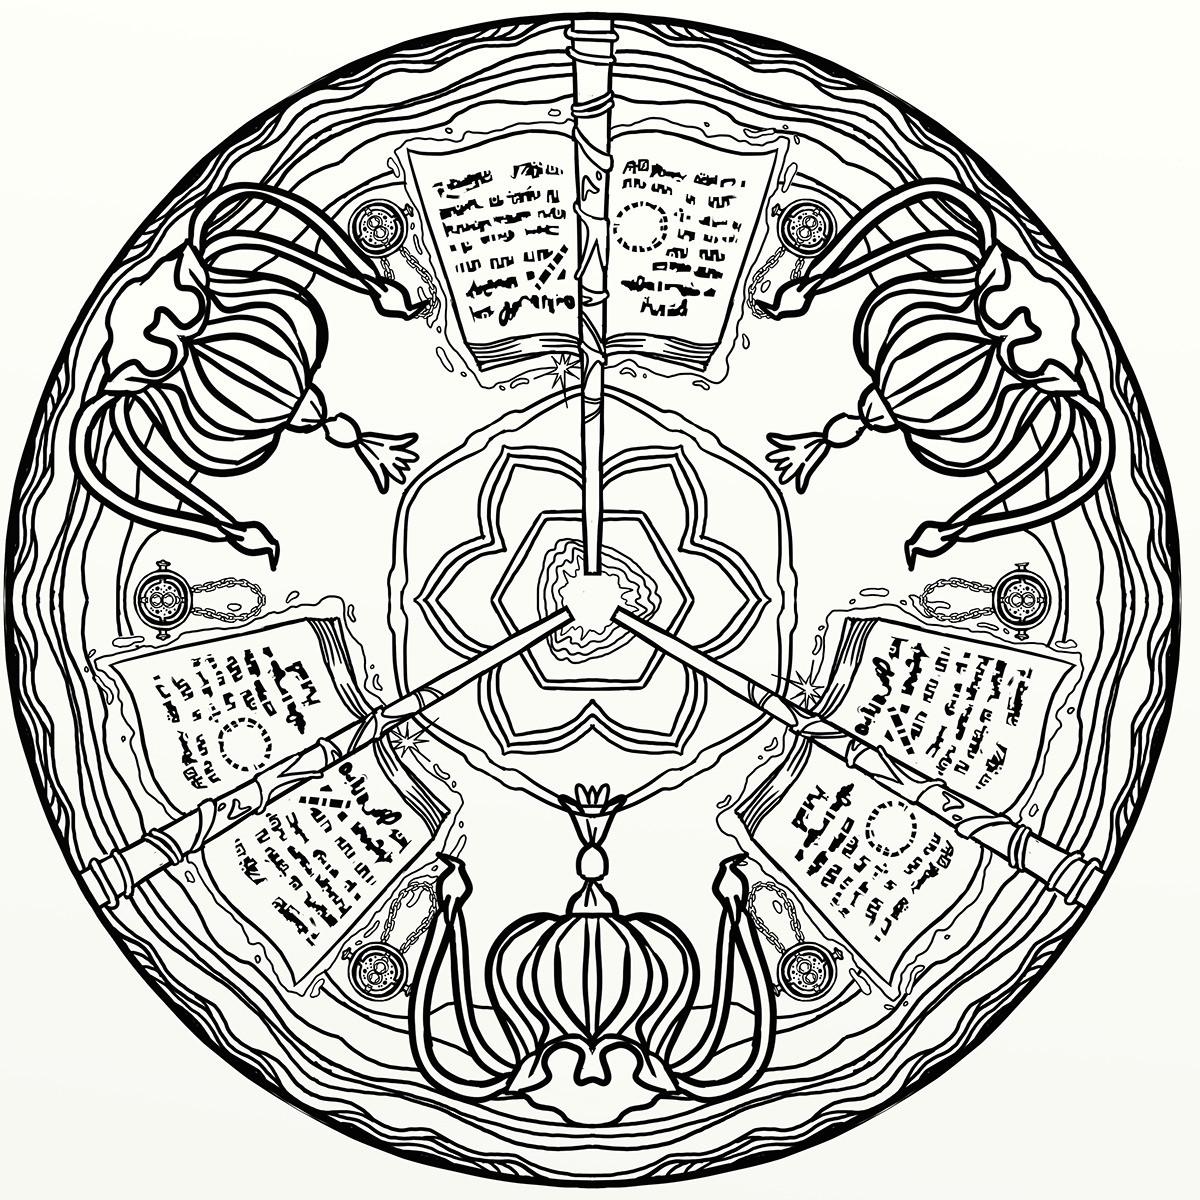 Ausmalbilder Harry Potter Das Beste Von Harry Potter Magical Places & Characters Mandala Art Behance Stock